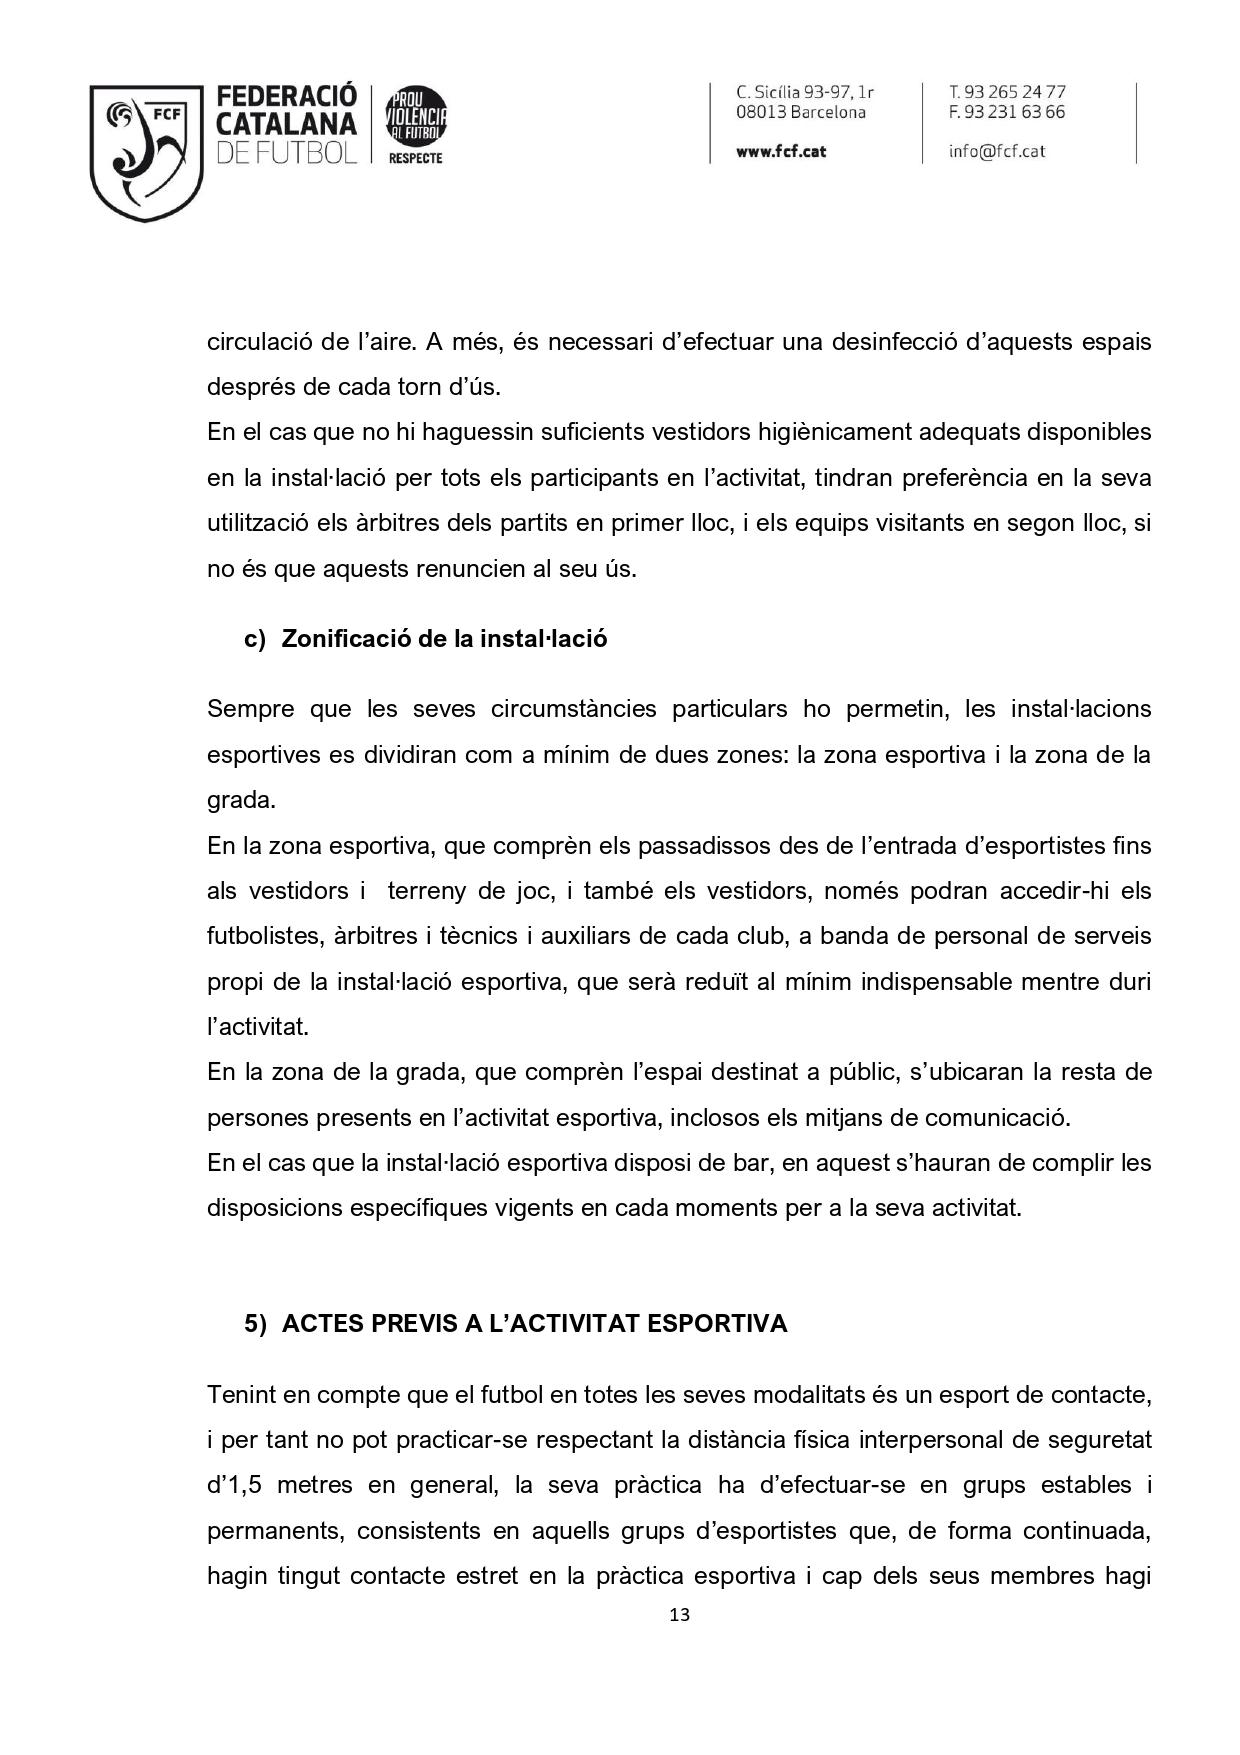 Circular Actualització Protocol Competicions _set21_2_page-0013